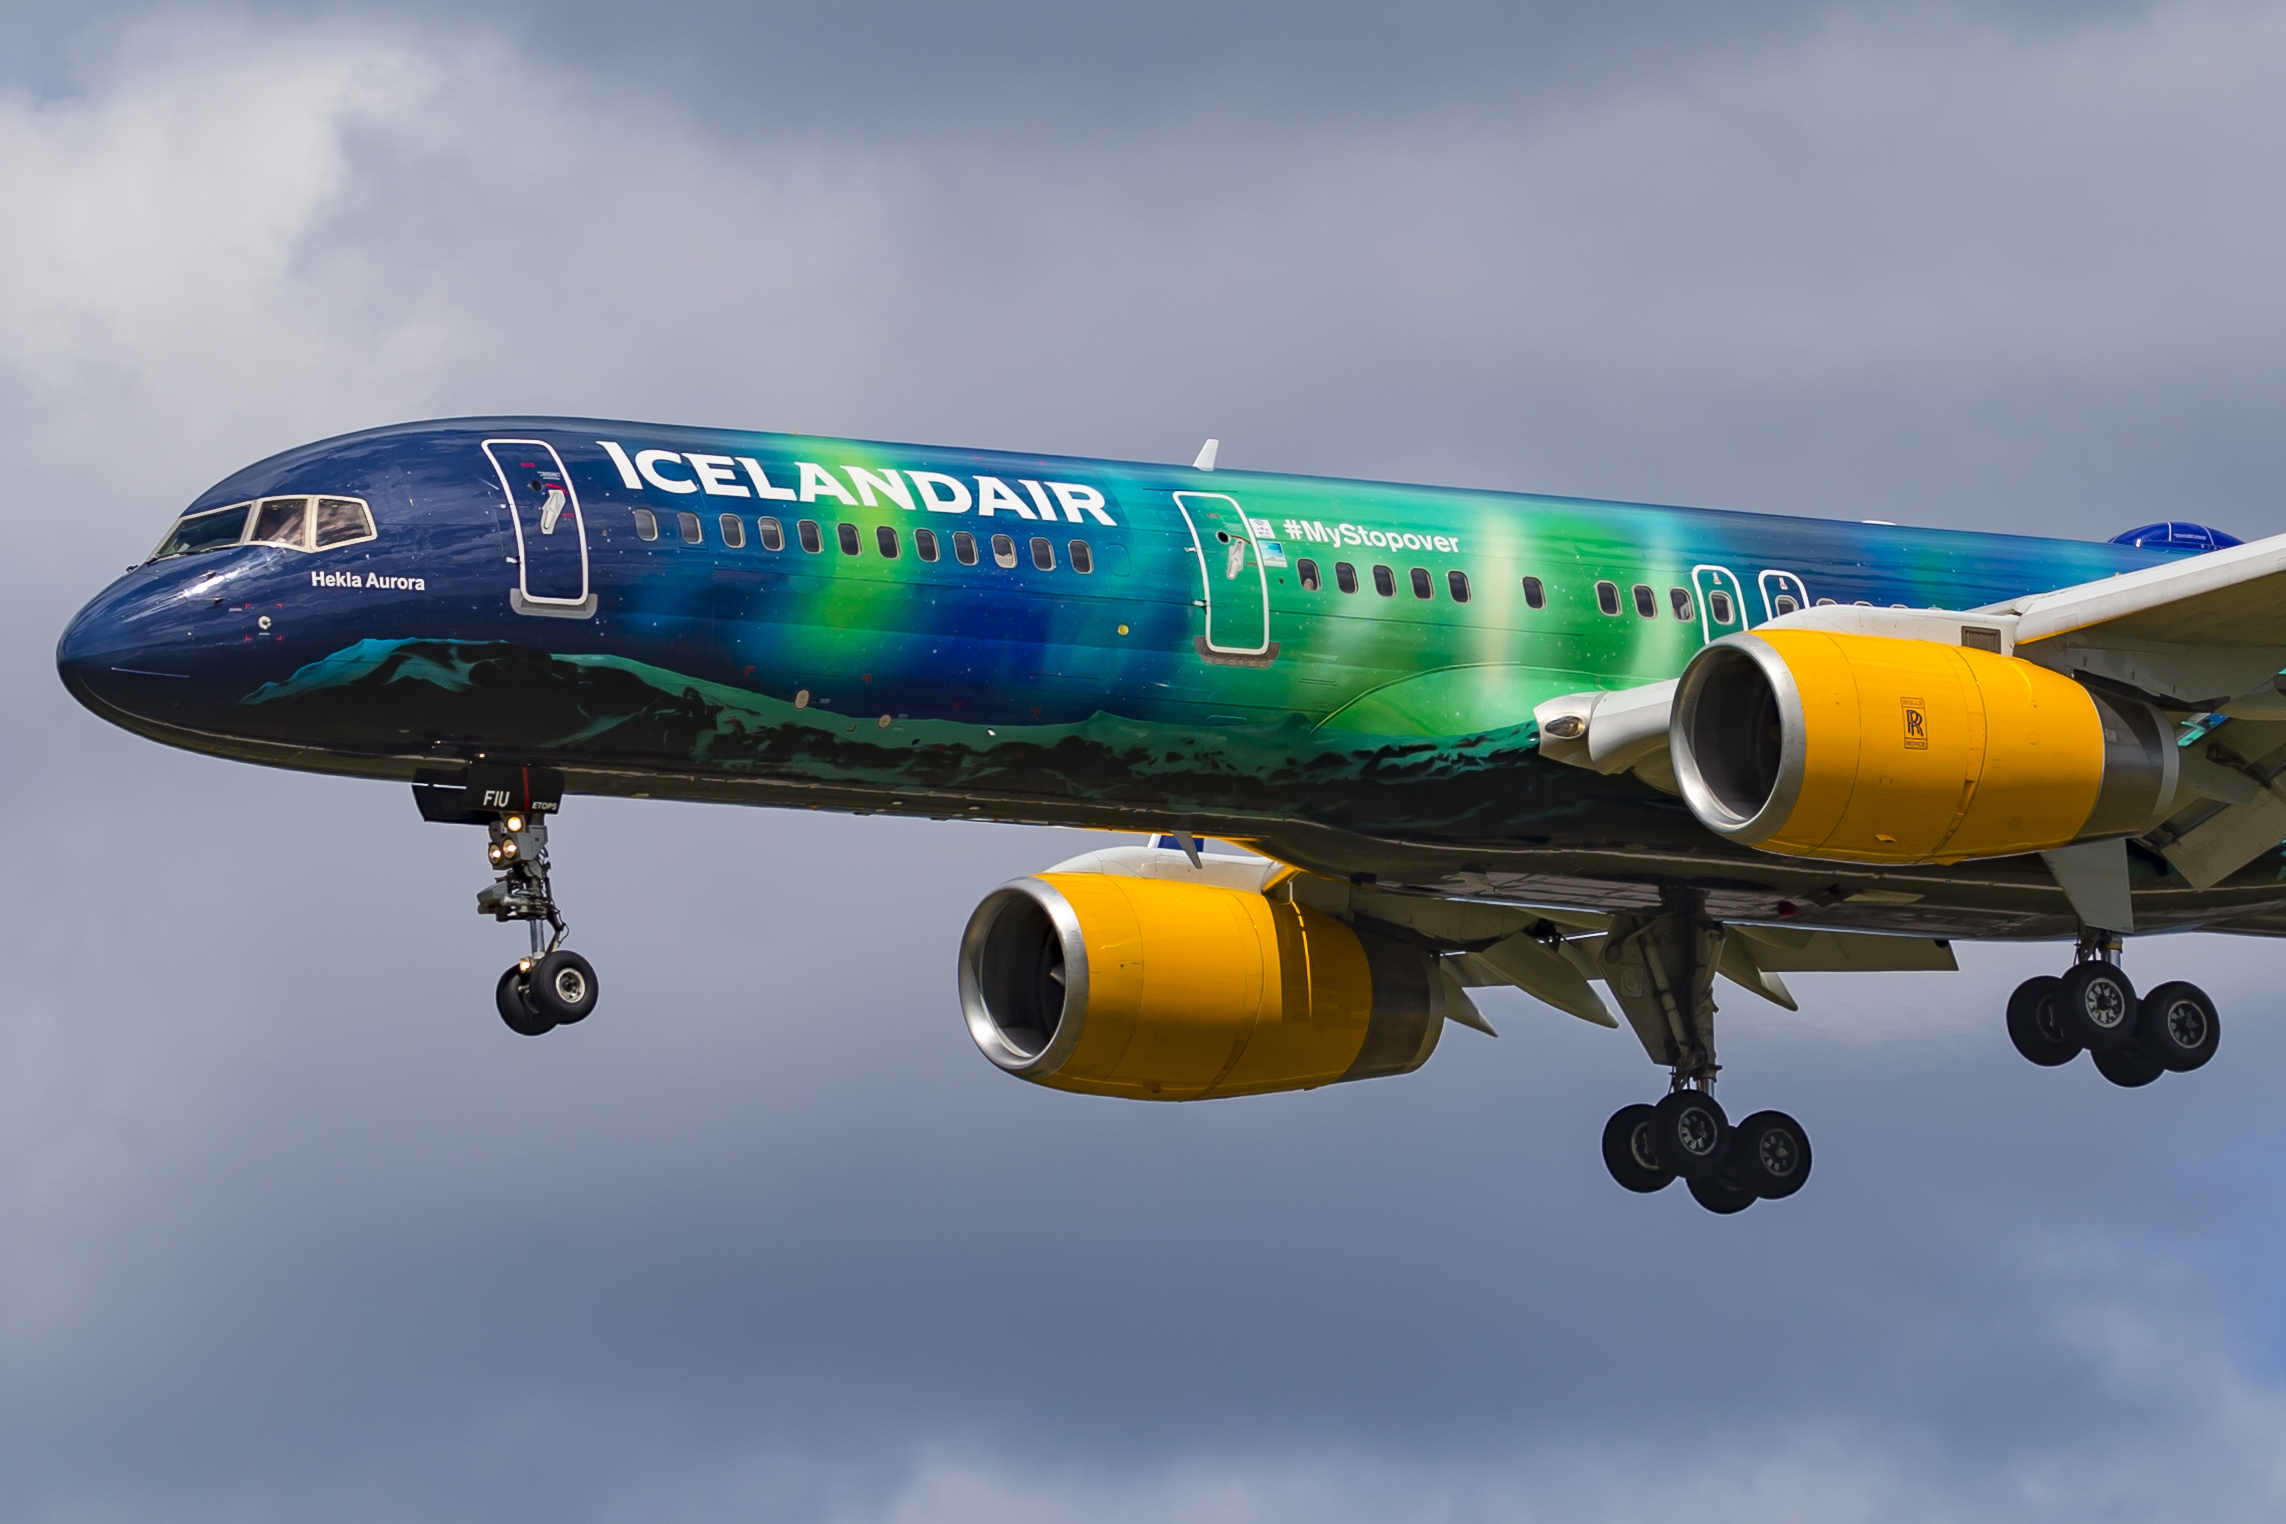 Boeing 757 Hekla Aurora fra Icelandair (Foto: © Thorbjørn Brunander Sund | Danish Aviation Photo)